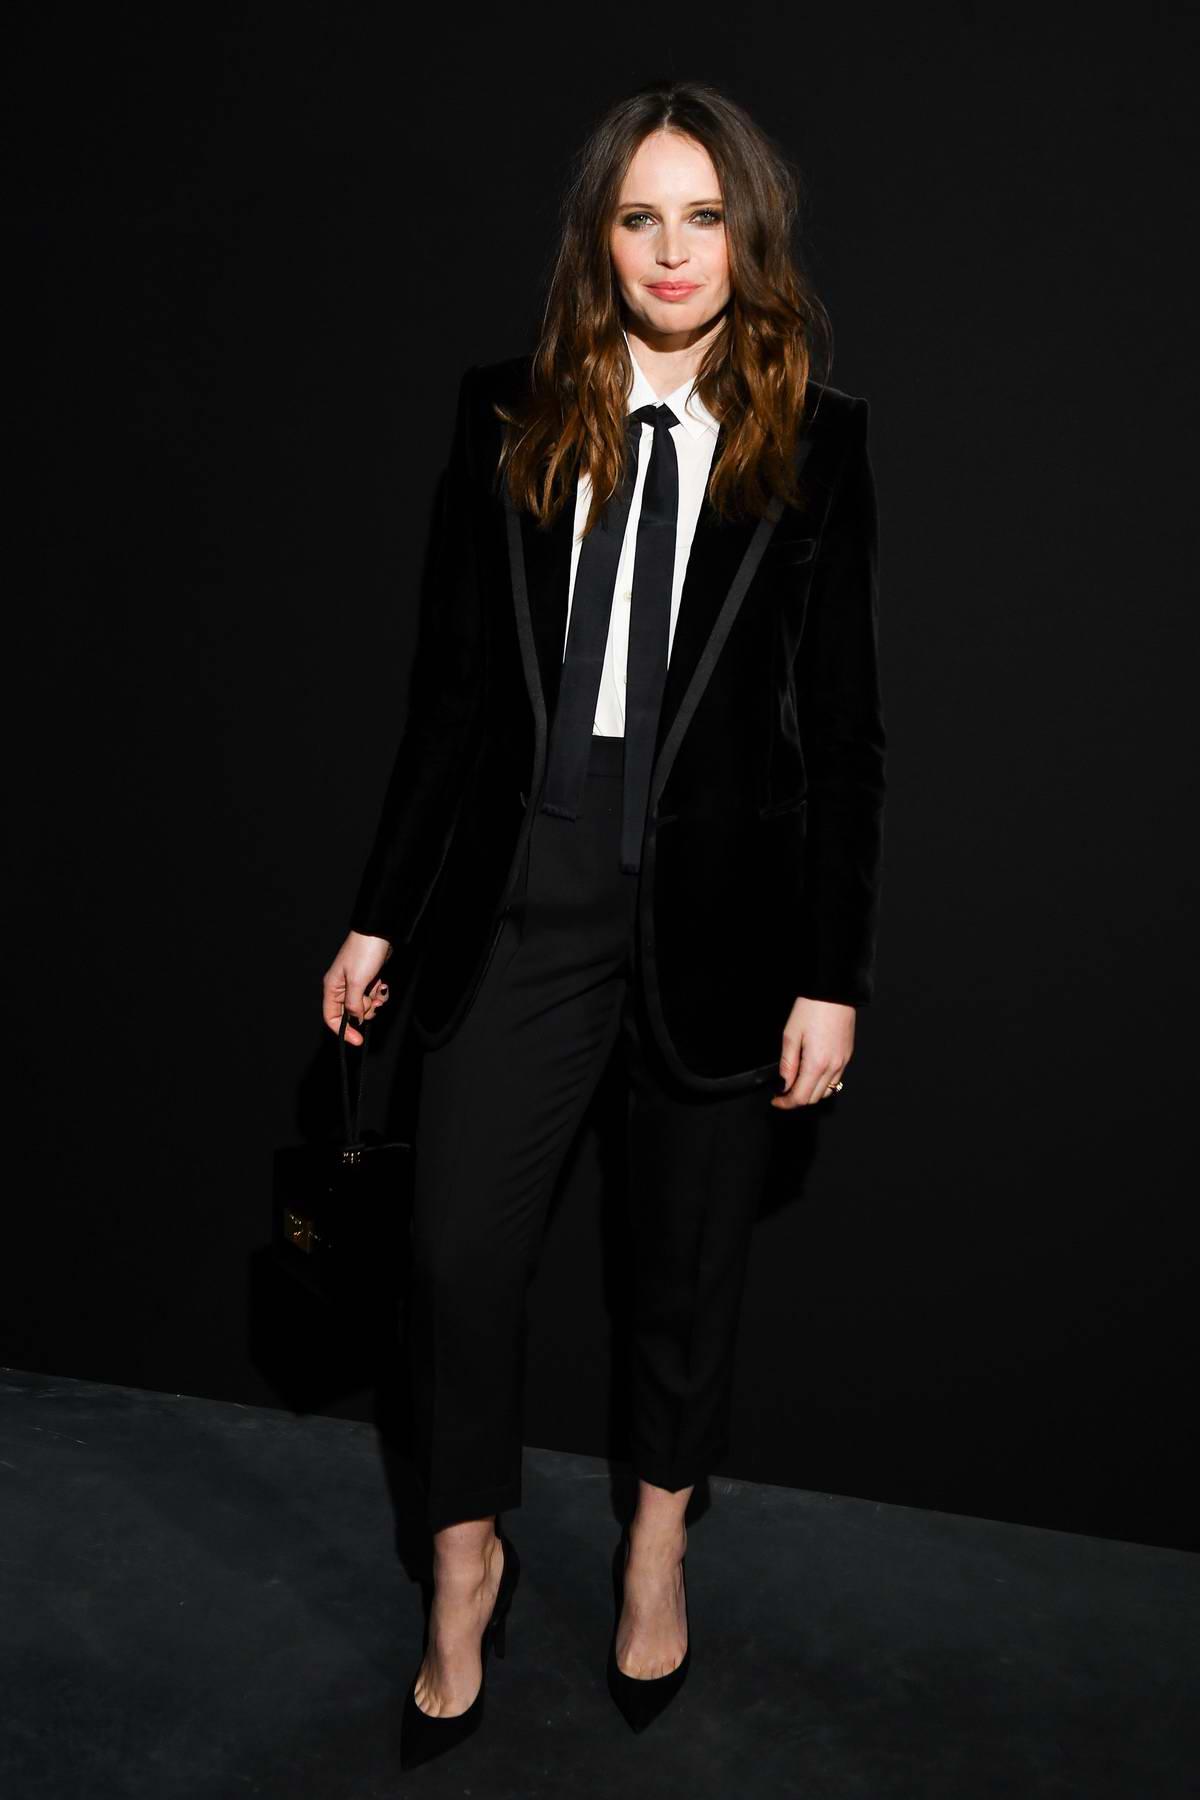 Felicity Jones attends the Saint Laurent show during Paris Fashion Week Womenswear Fall/Winter 2019/2020 in Paris, France